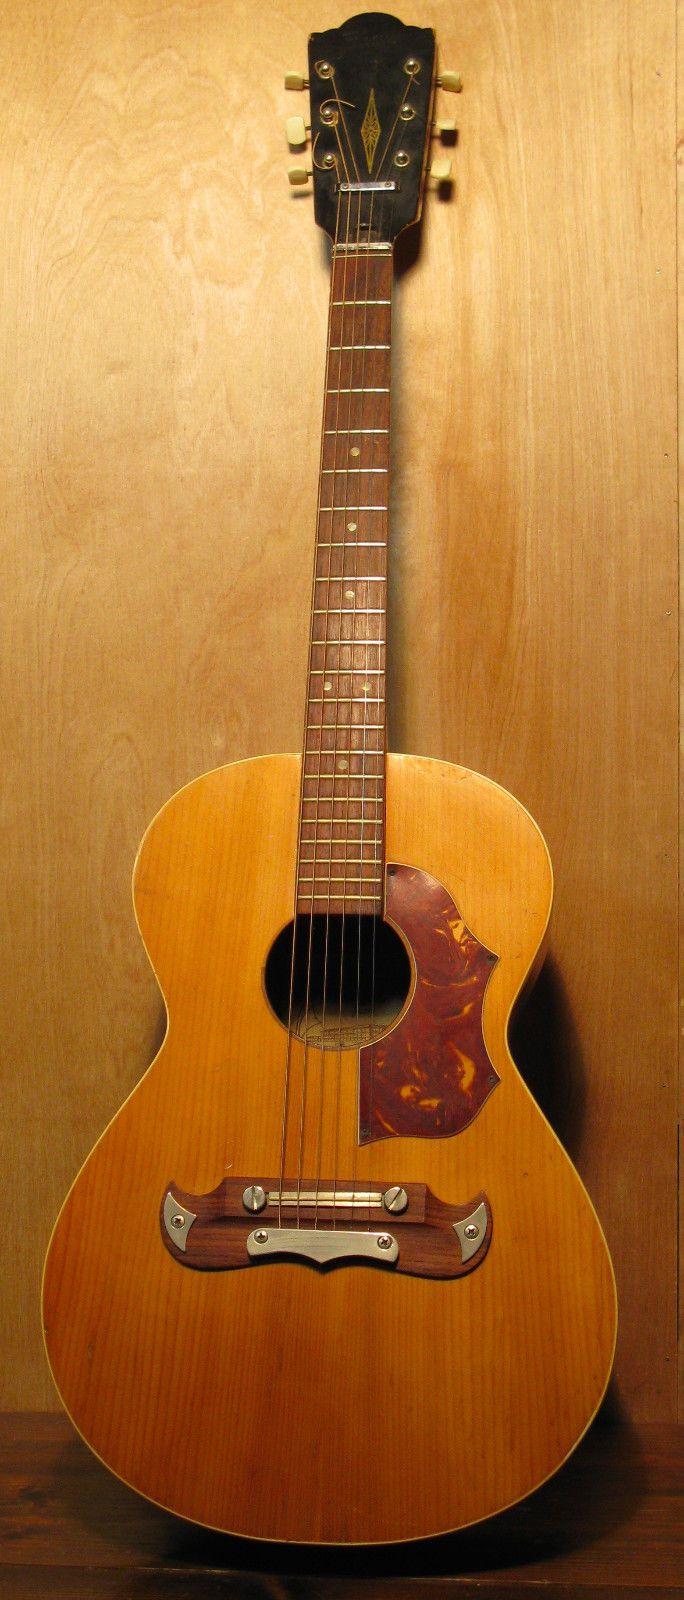 Vintage 60 S Framus Gaucho 5 194 Acoustic Guitar Made In Germany Vintage Guitars Guitar Fender Acoustic Guitar